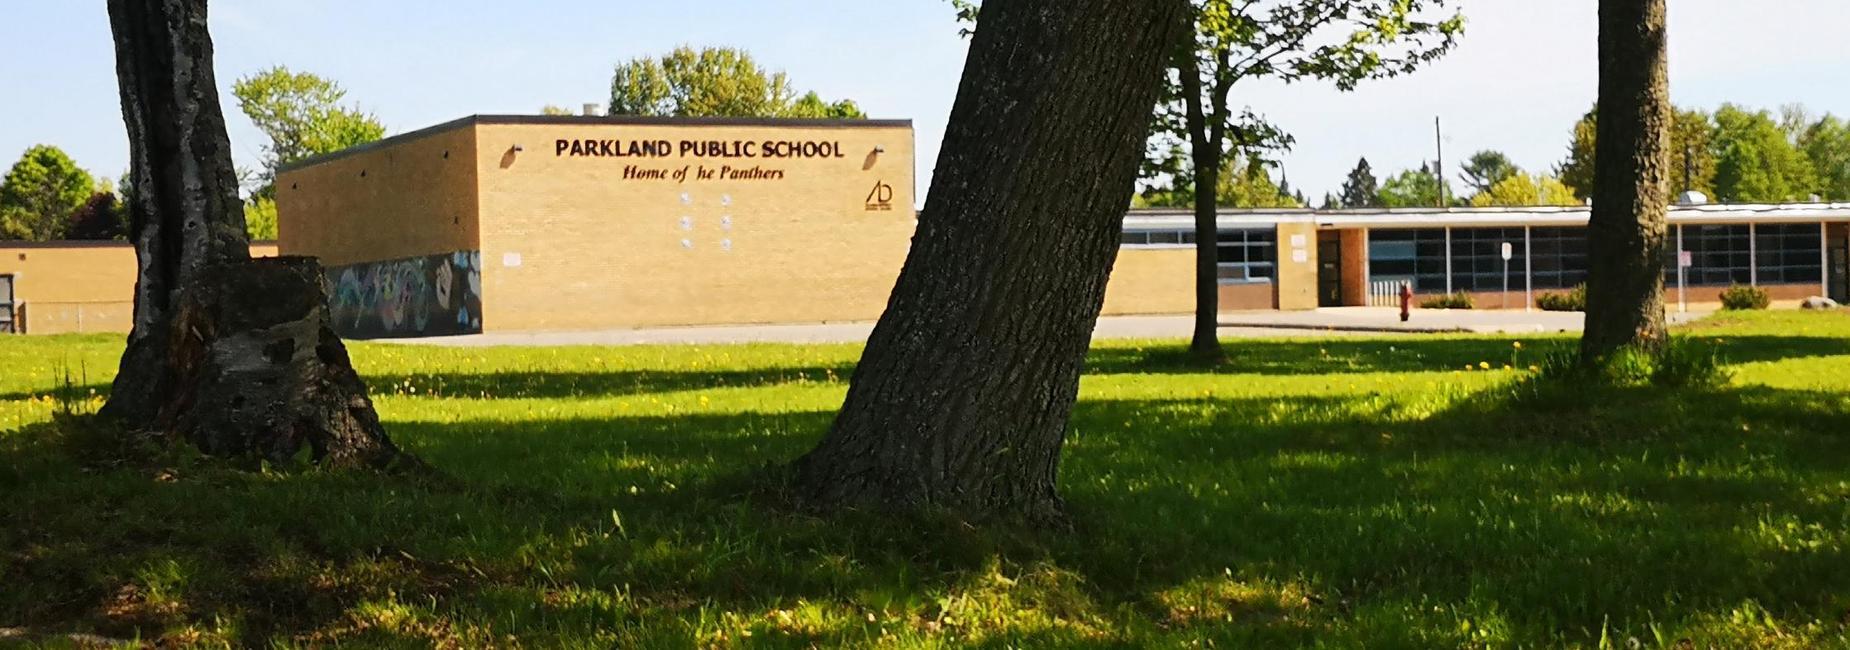 Parkland Public School